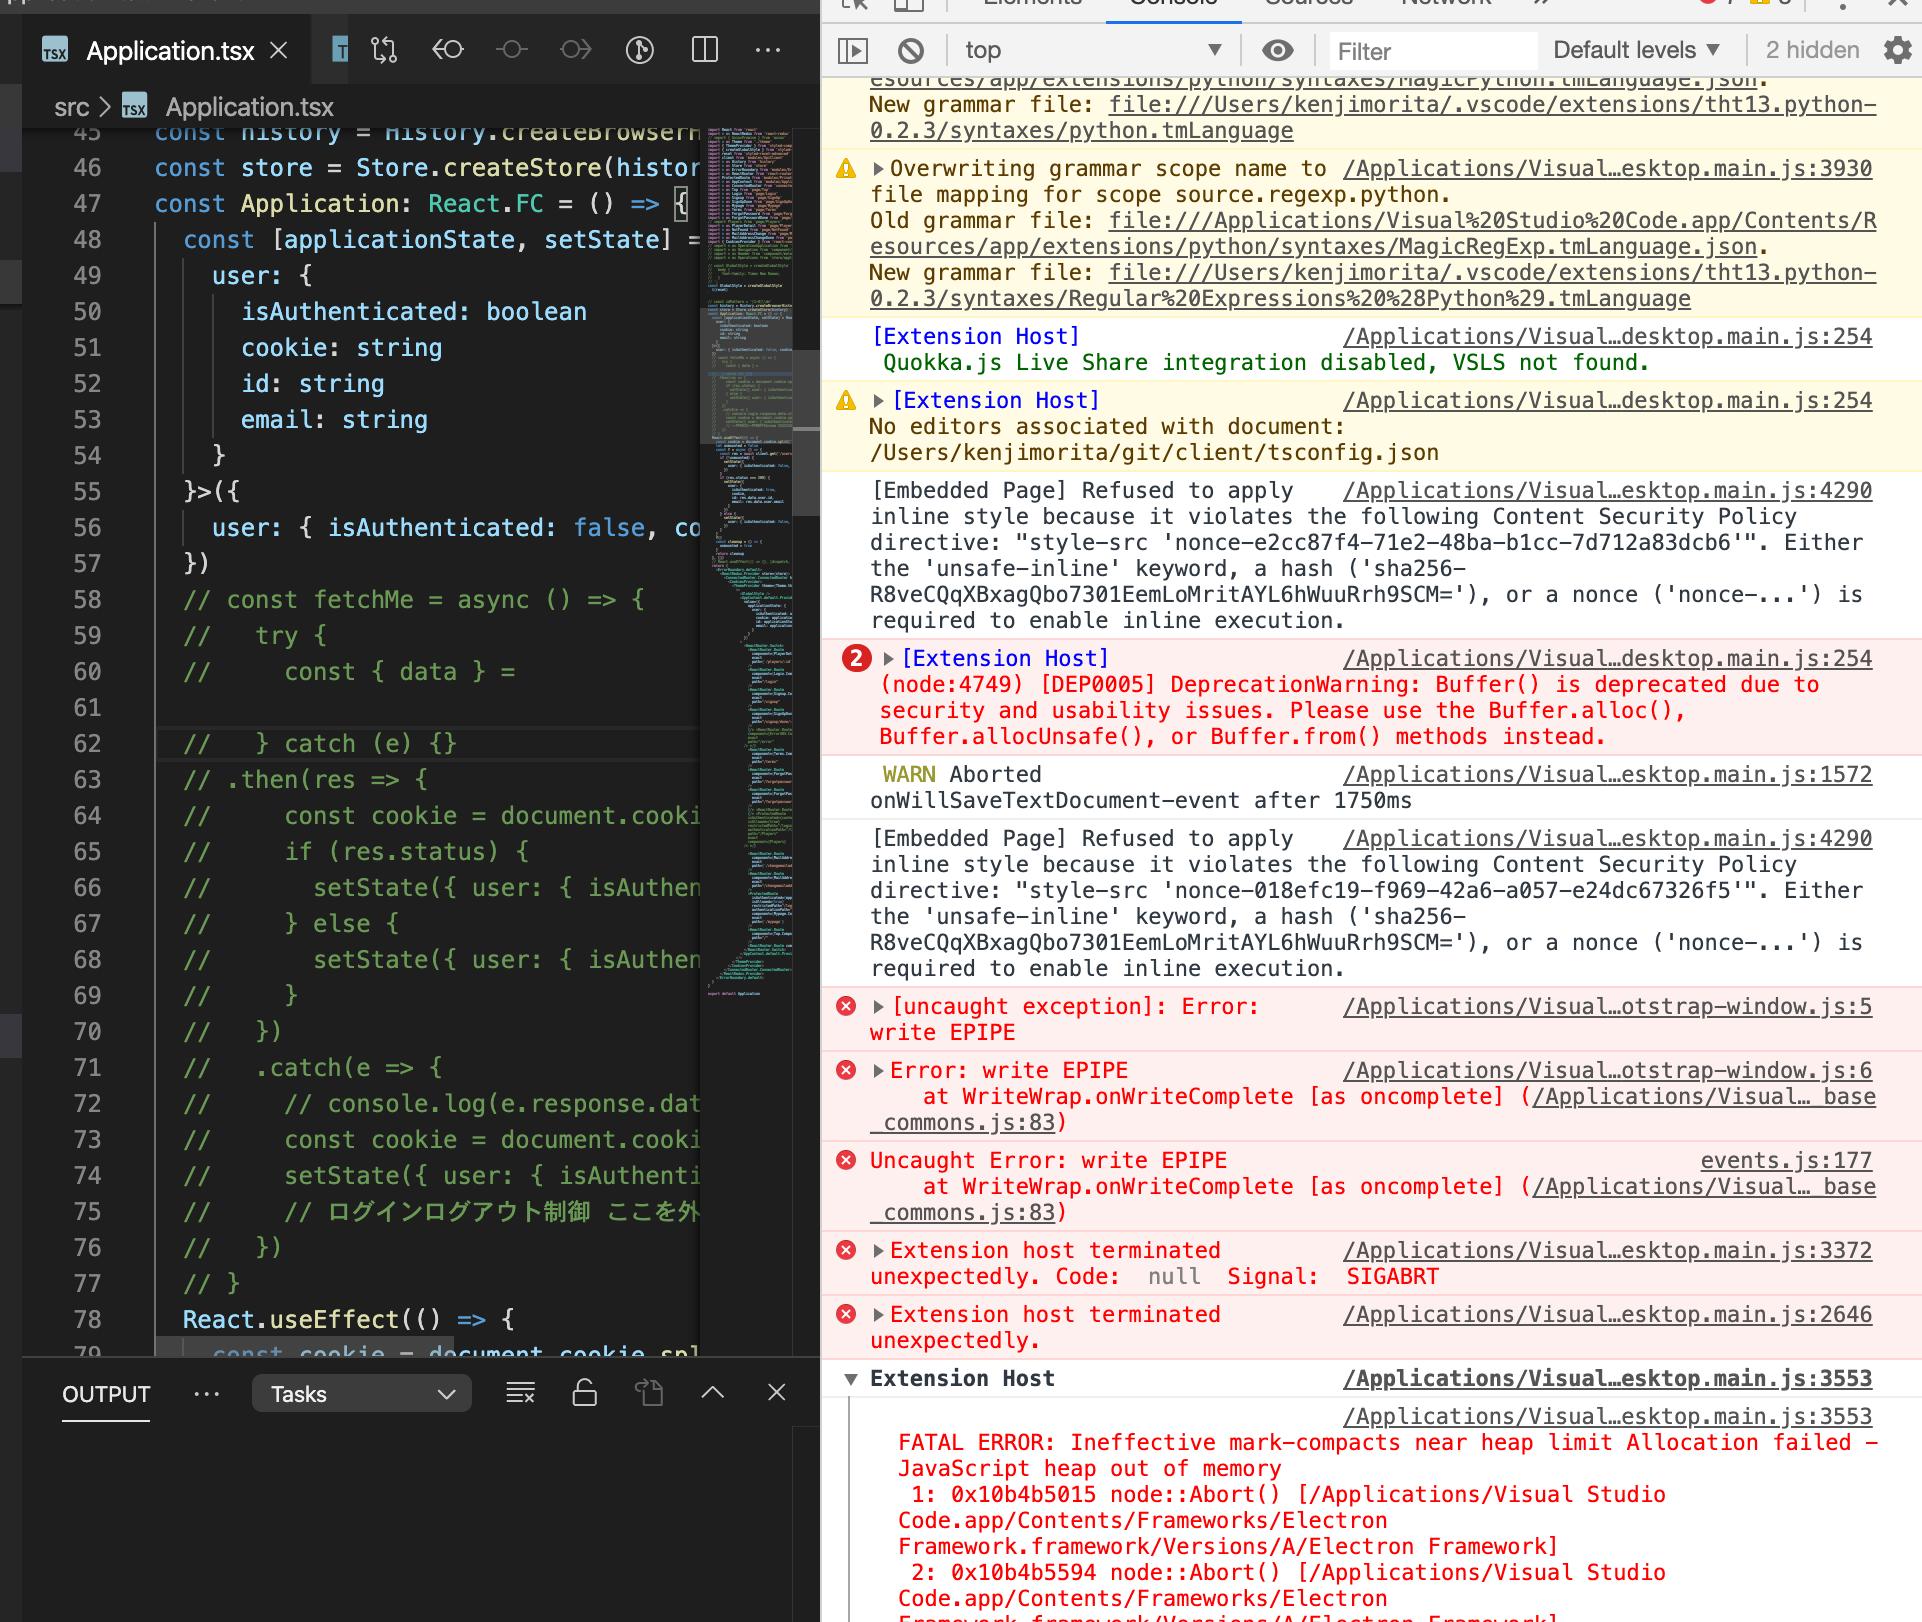 vscode vim suddenly stops working。vscodevim(1.12.2)でバックスペース削除ができなくなる問題